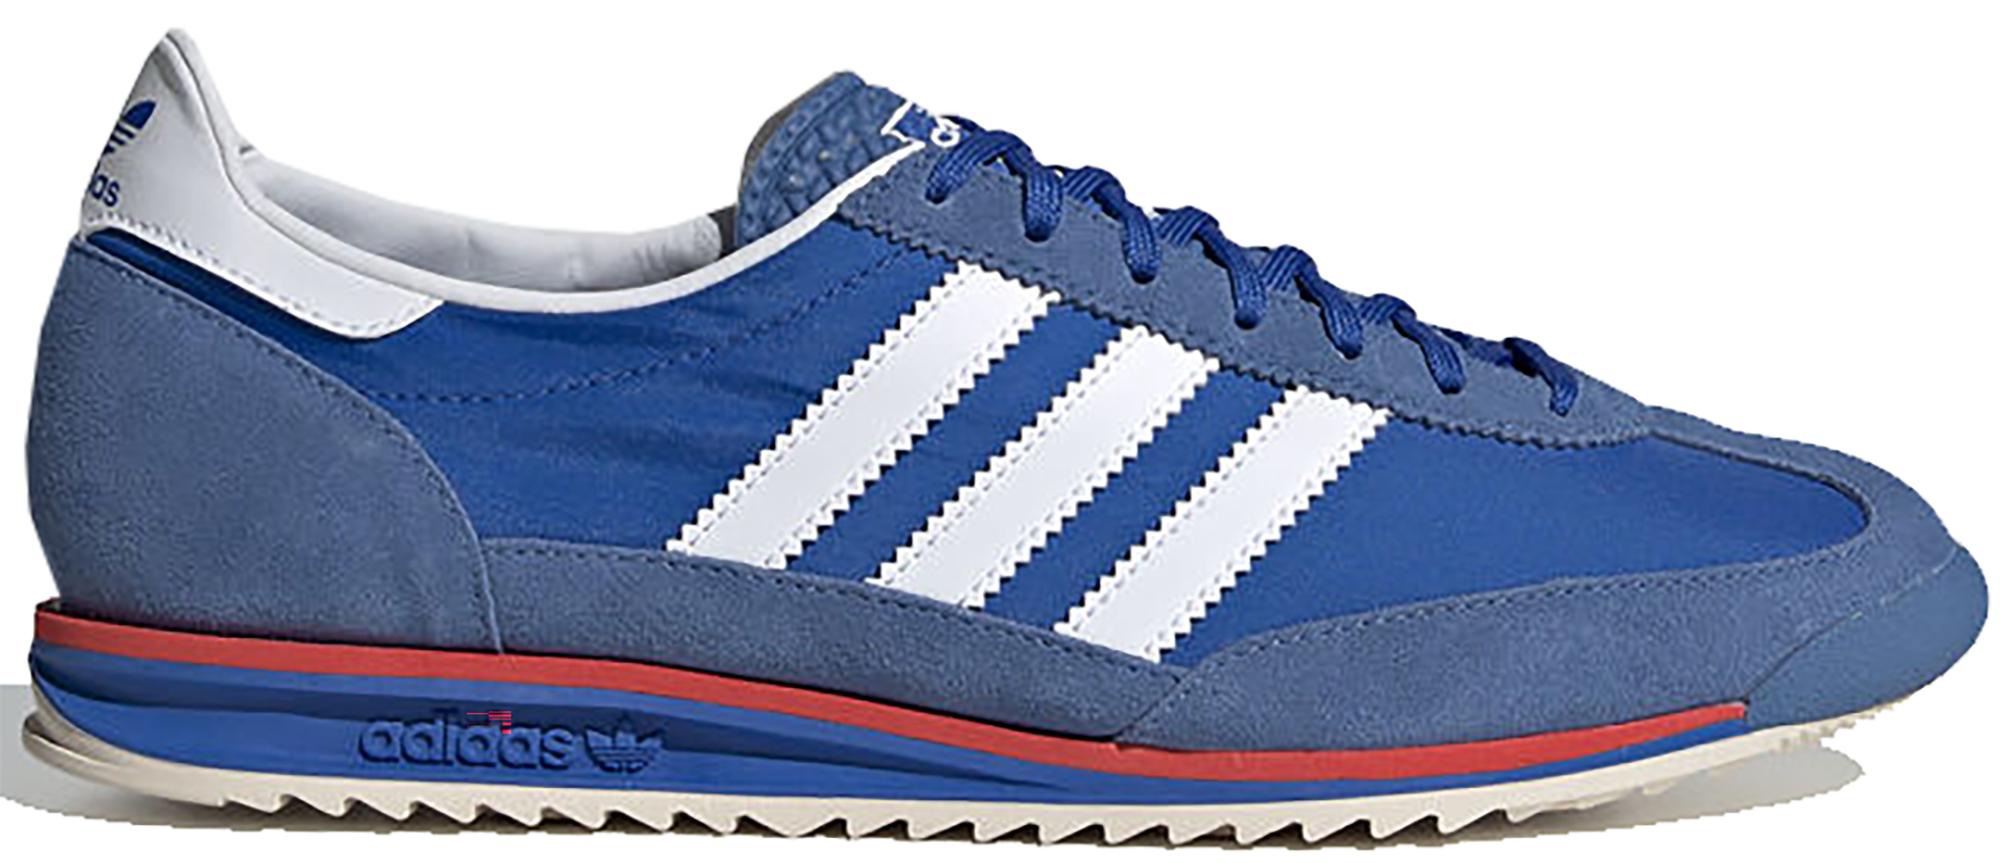 adidas SL 72 Blue White Red - EG6849